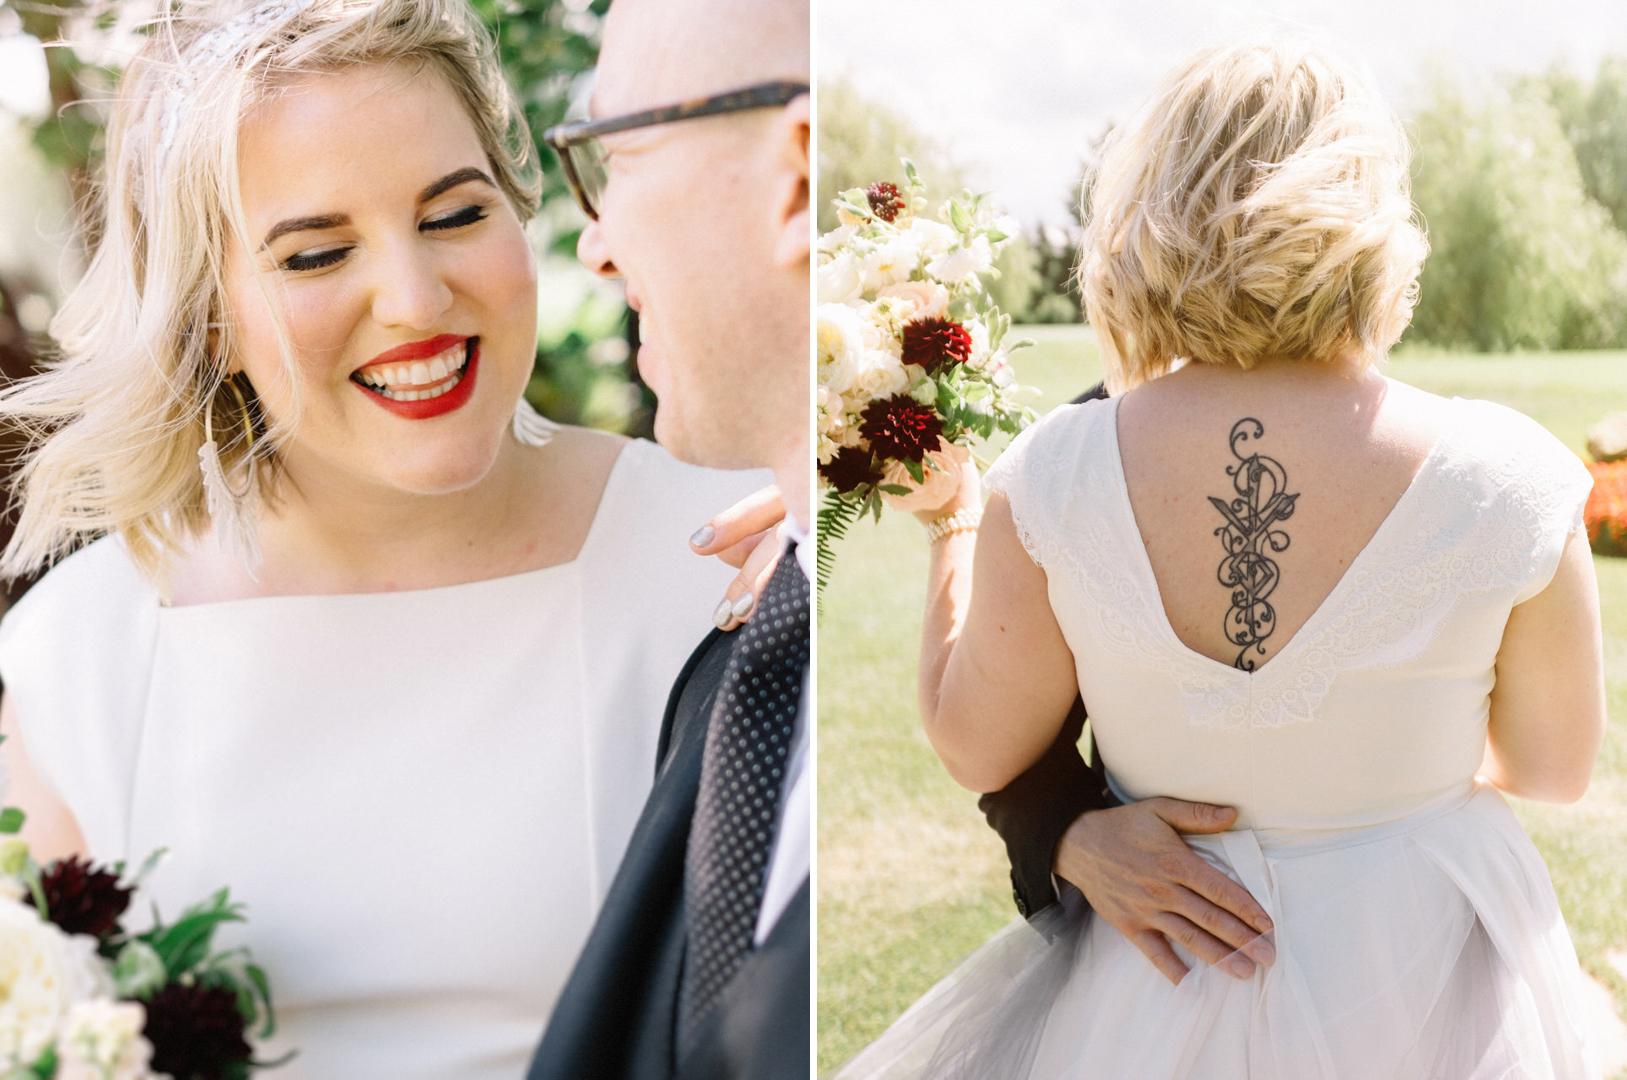 wedding rocker bride wedding dress.jpg